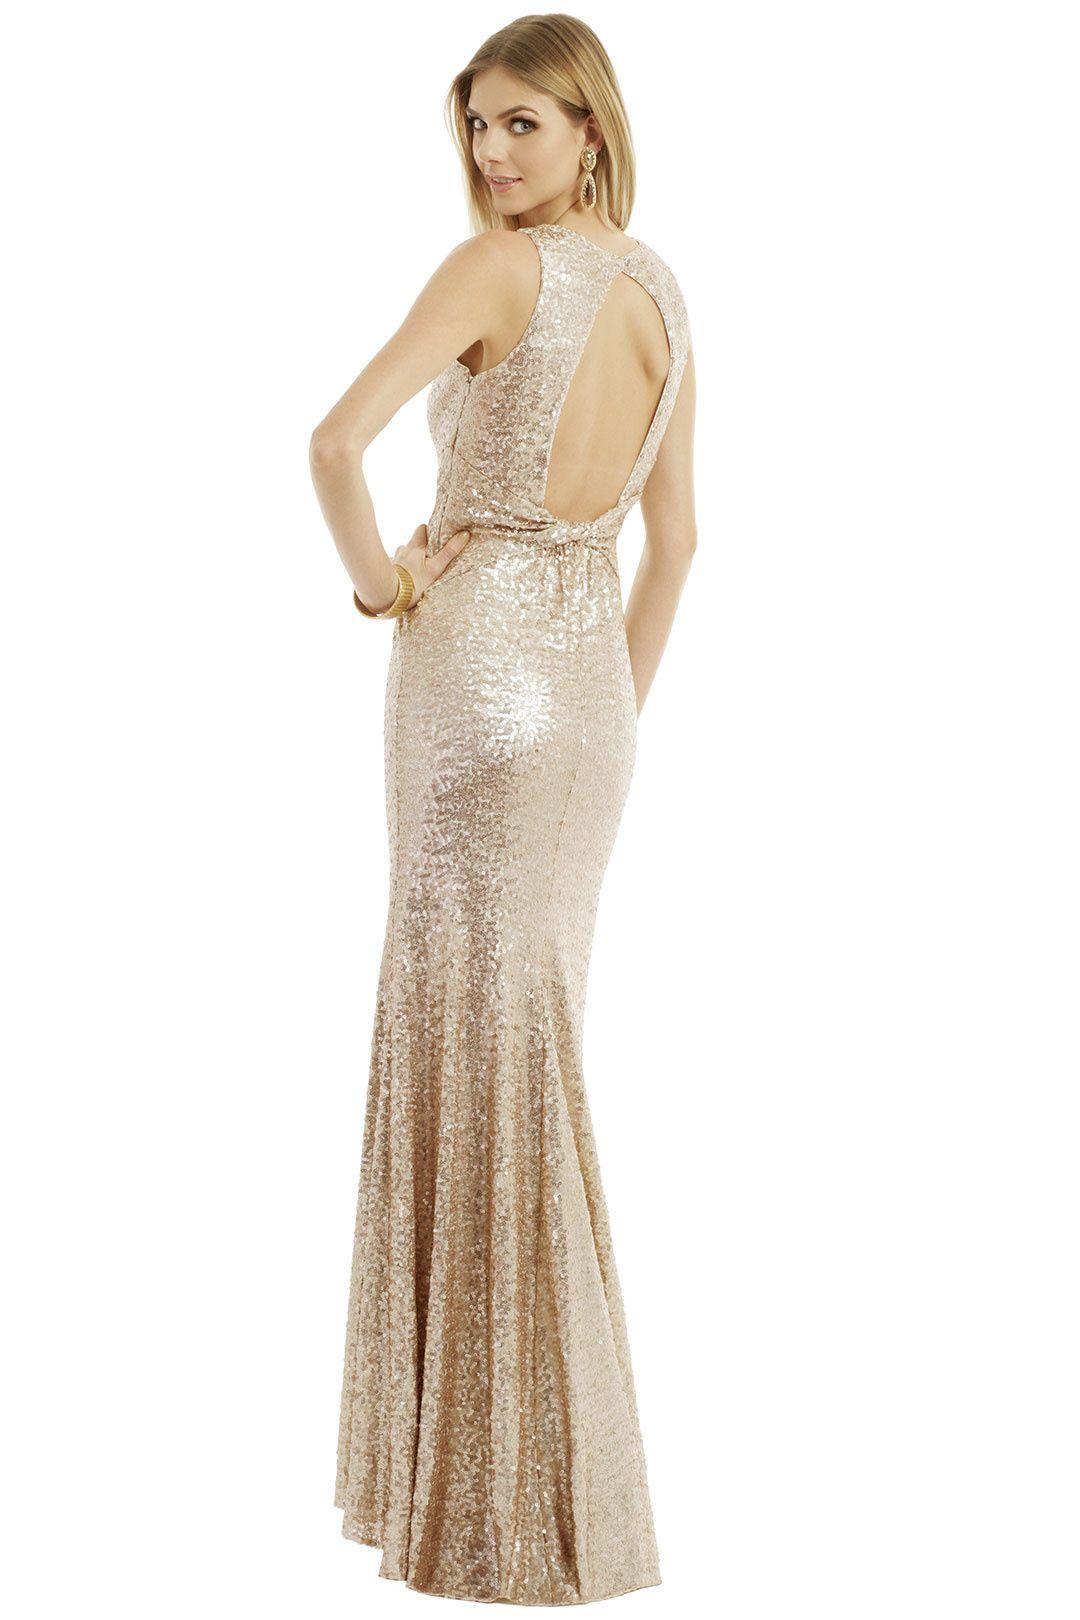 Beaded metallic and sequined bridesmaid dresses gold beaded metallic and sequined bridesmaid dresses ombrellifo Gallery